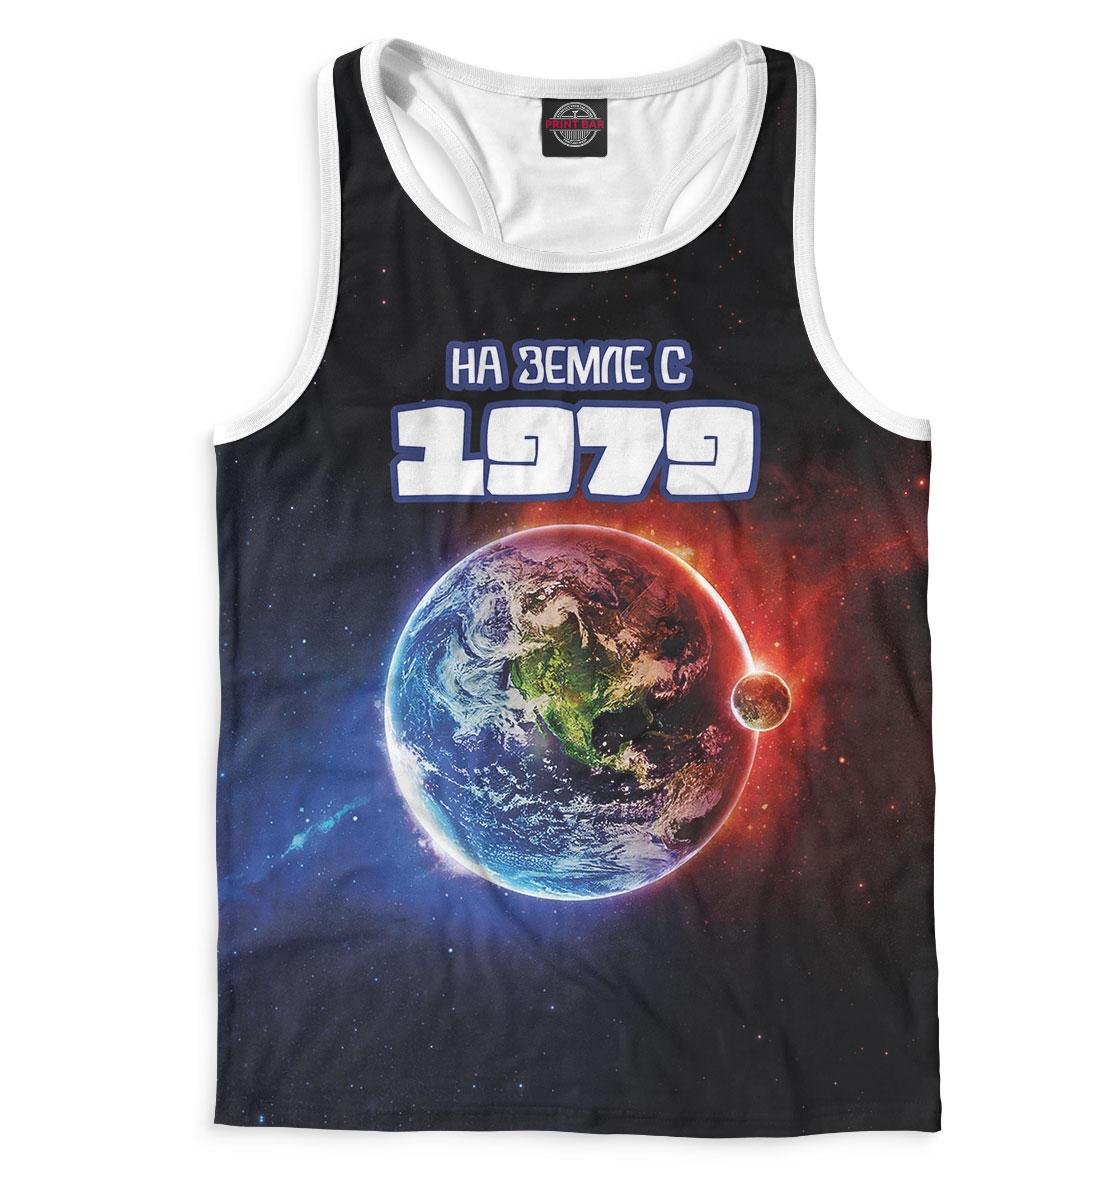 Купить На Земле с 1979, Printbar, Майки борцовки, DSD-361820-mayb-2